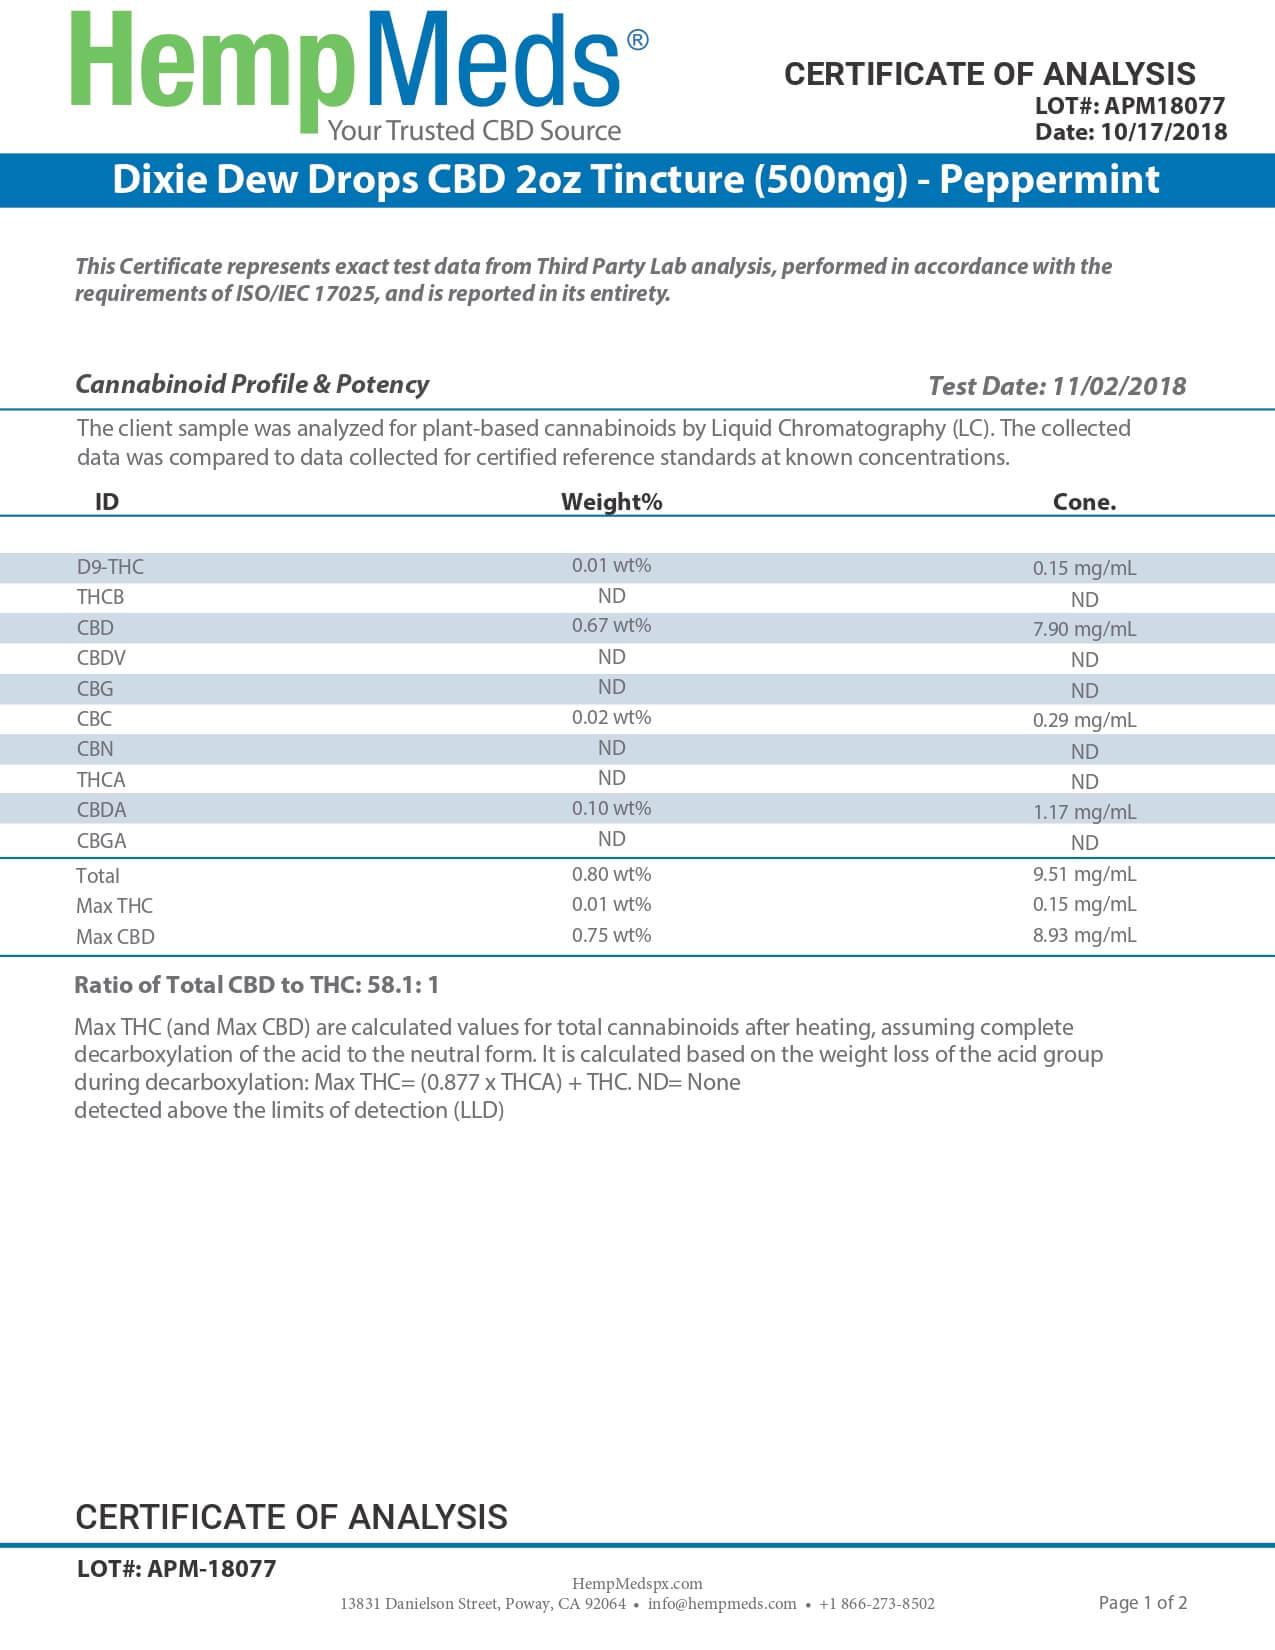 Dixie Botanicals CBD Tincture Peppermint 2oz Dew Drops 500mg Lab Report